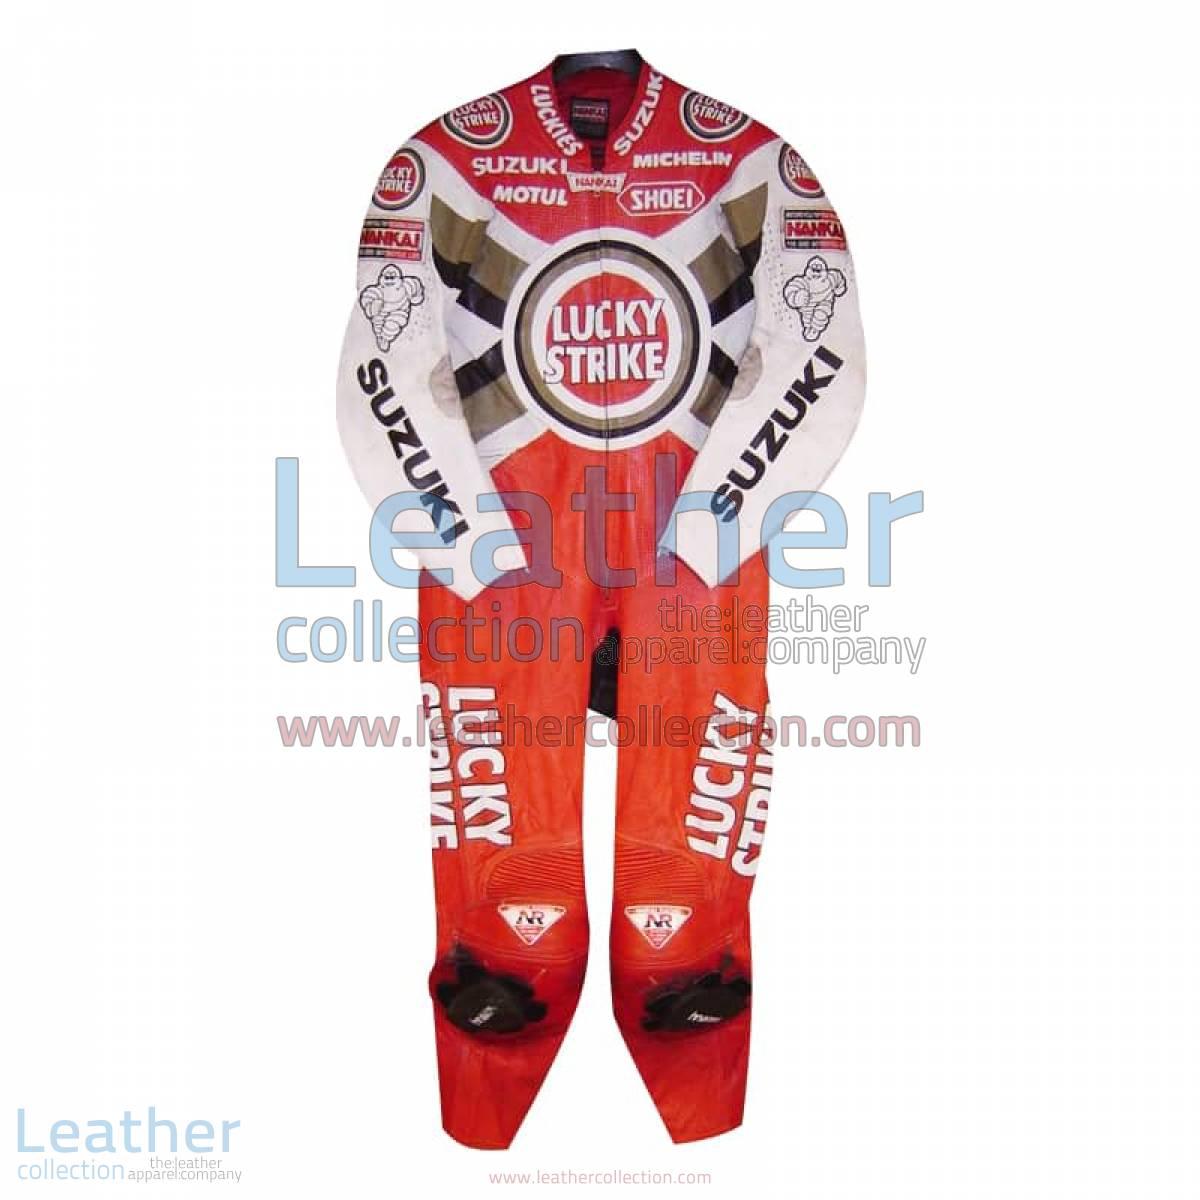 Daryl Beattie Suzuki Lucky Strike Leathers 1995 MotoGP | motogp leathers